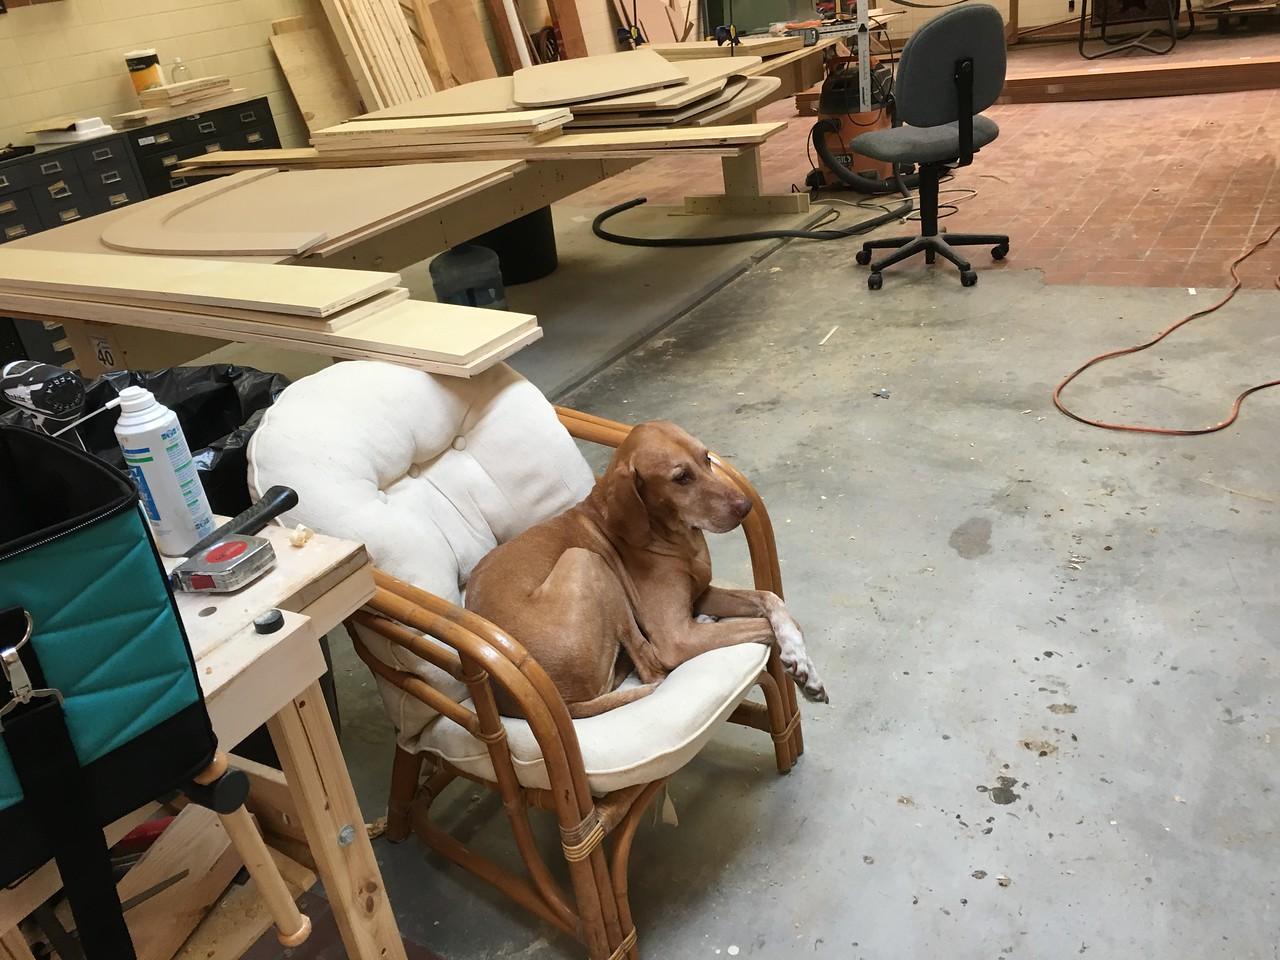 Shop Foreman